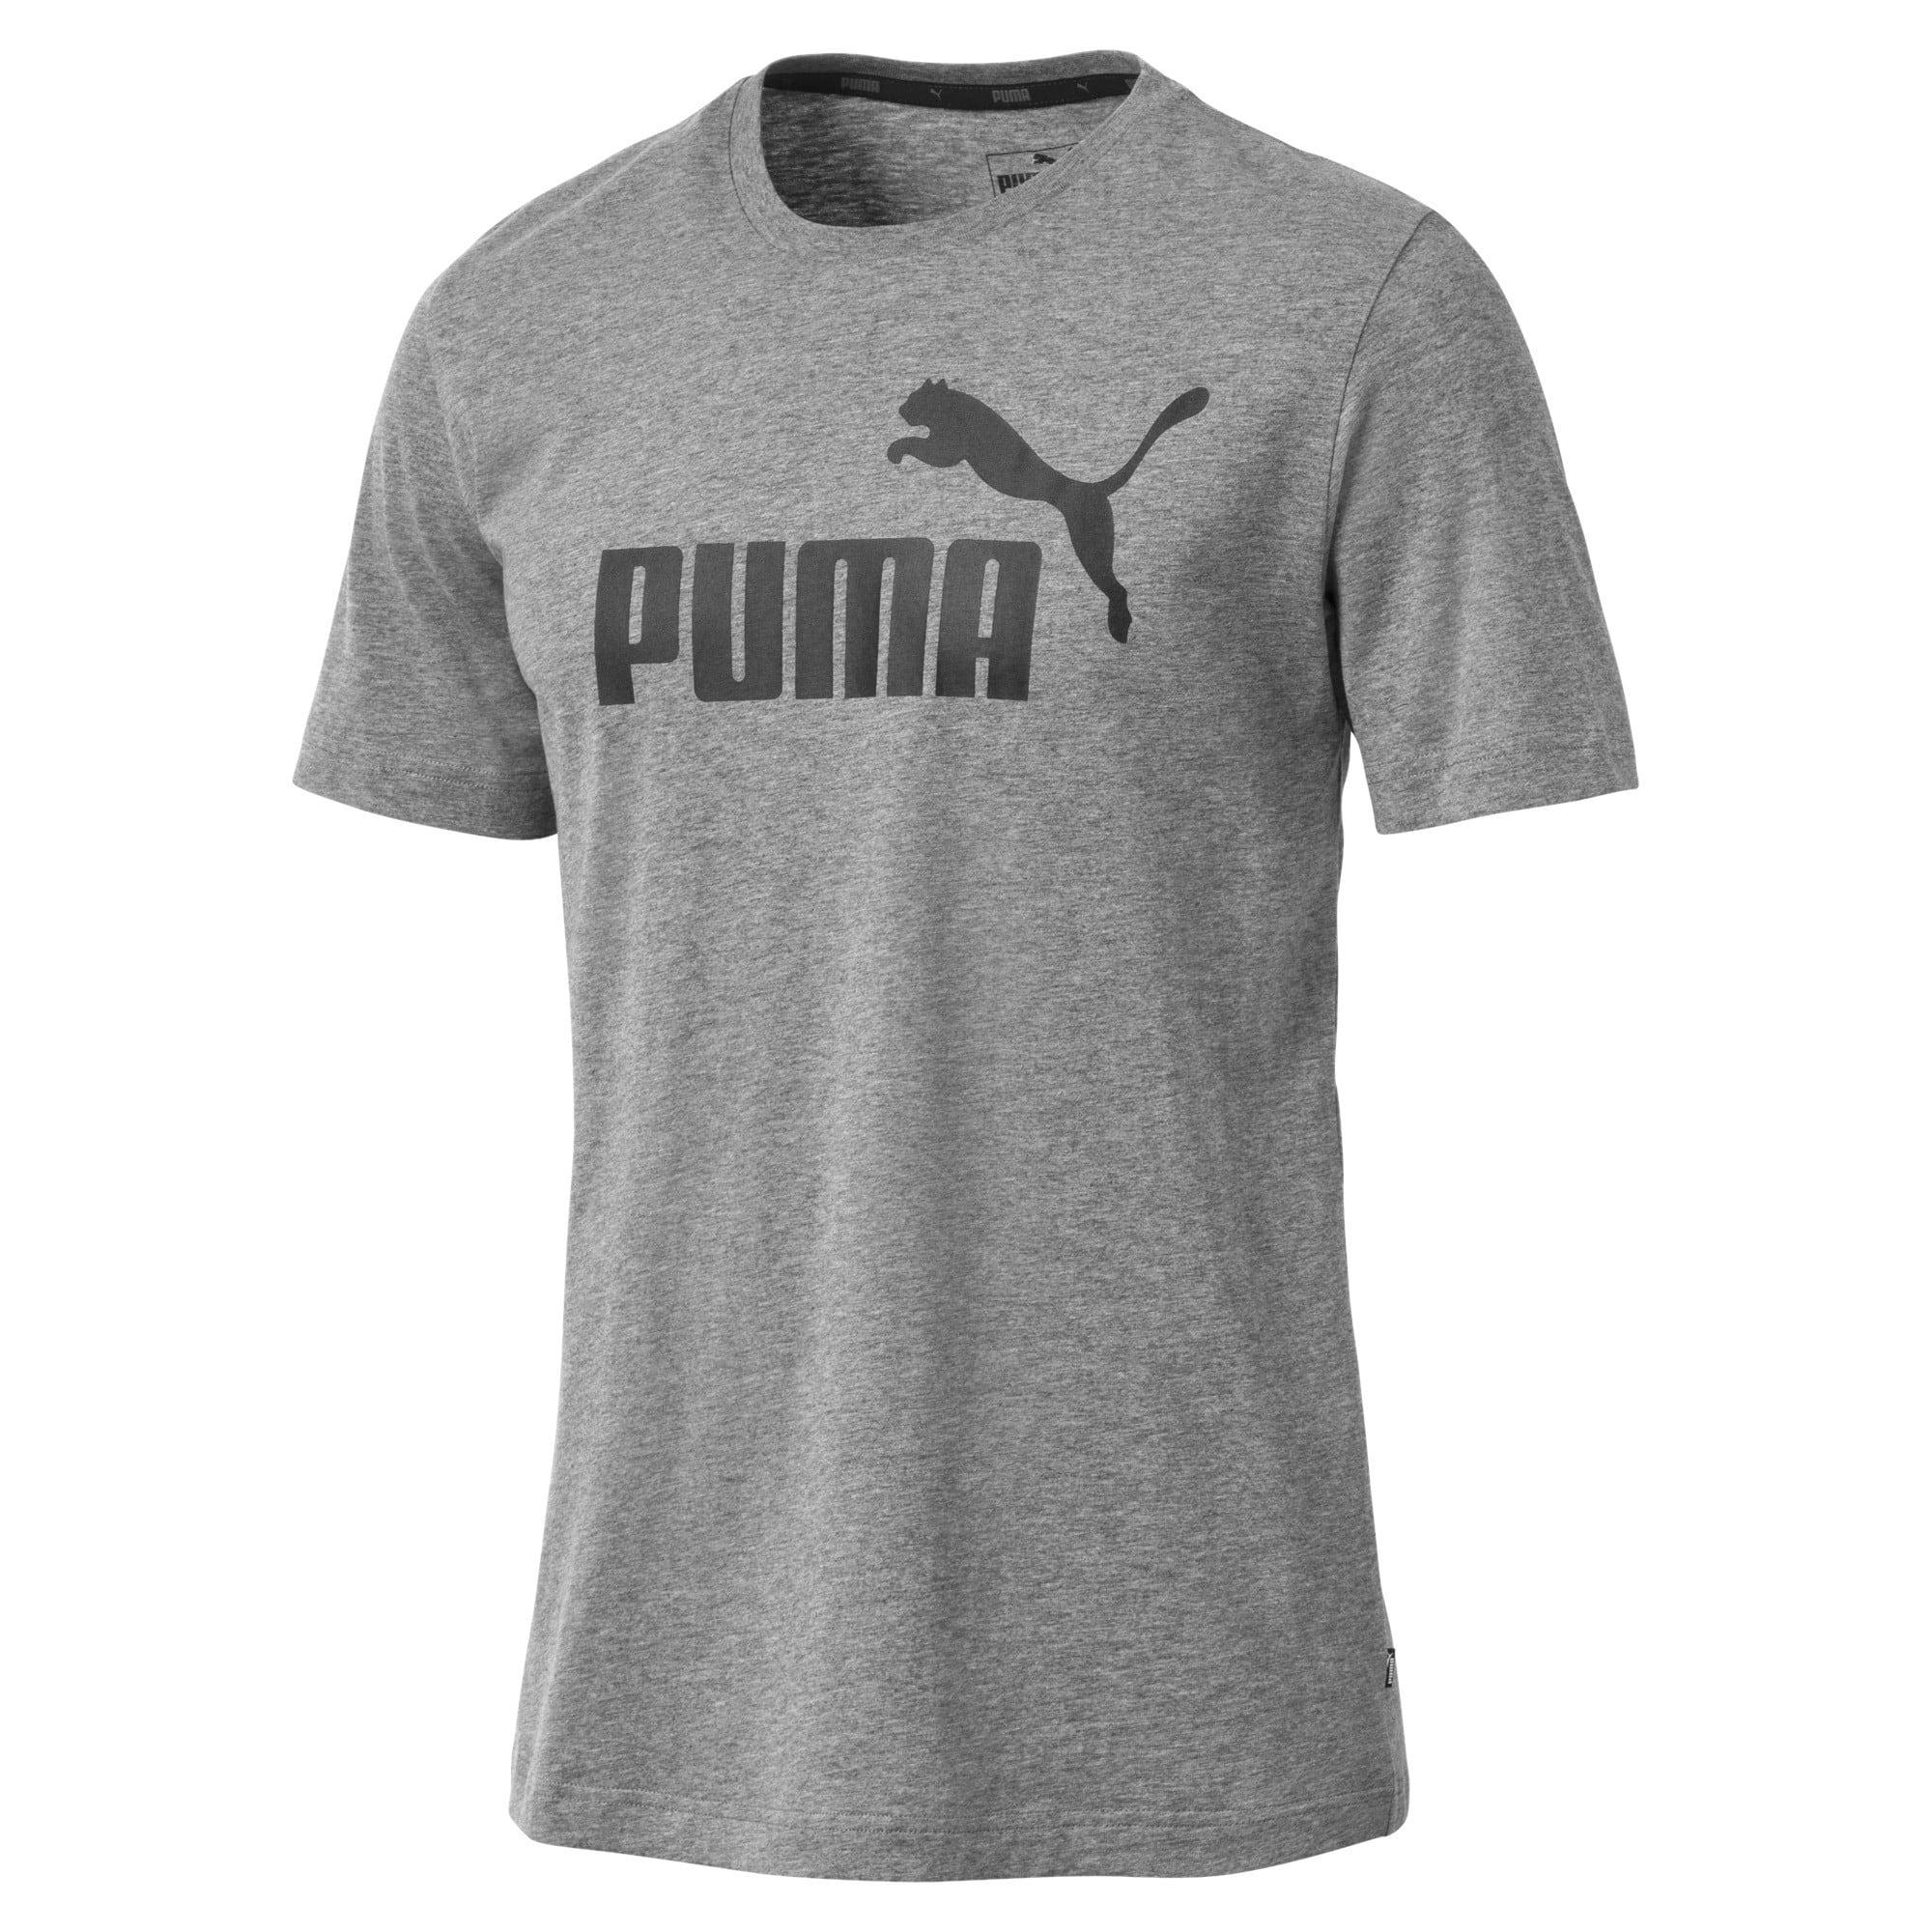 Thumbnail 1 of T-shirt a maniche corte Essentials uomo, Medium Gray Heather, medium